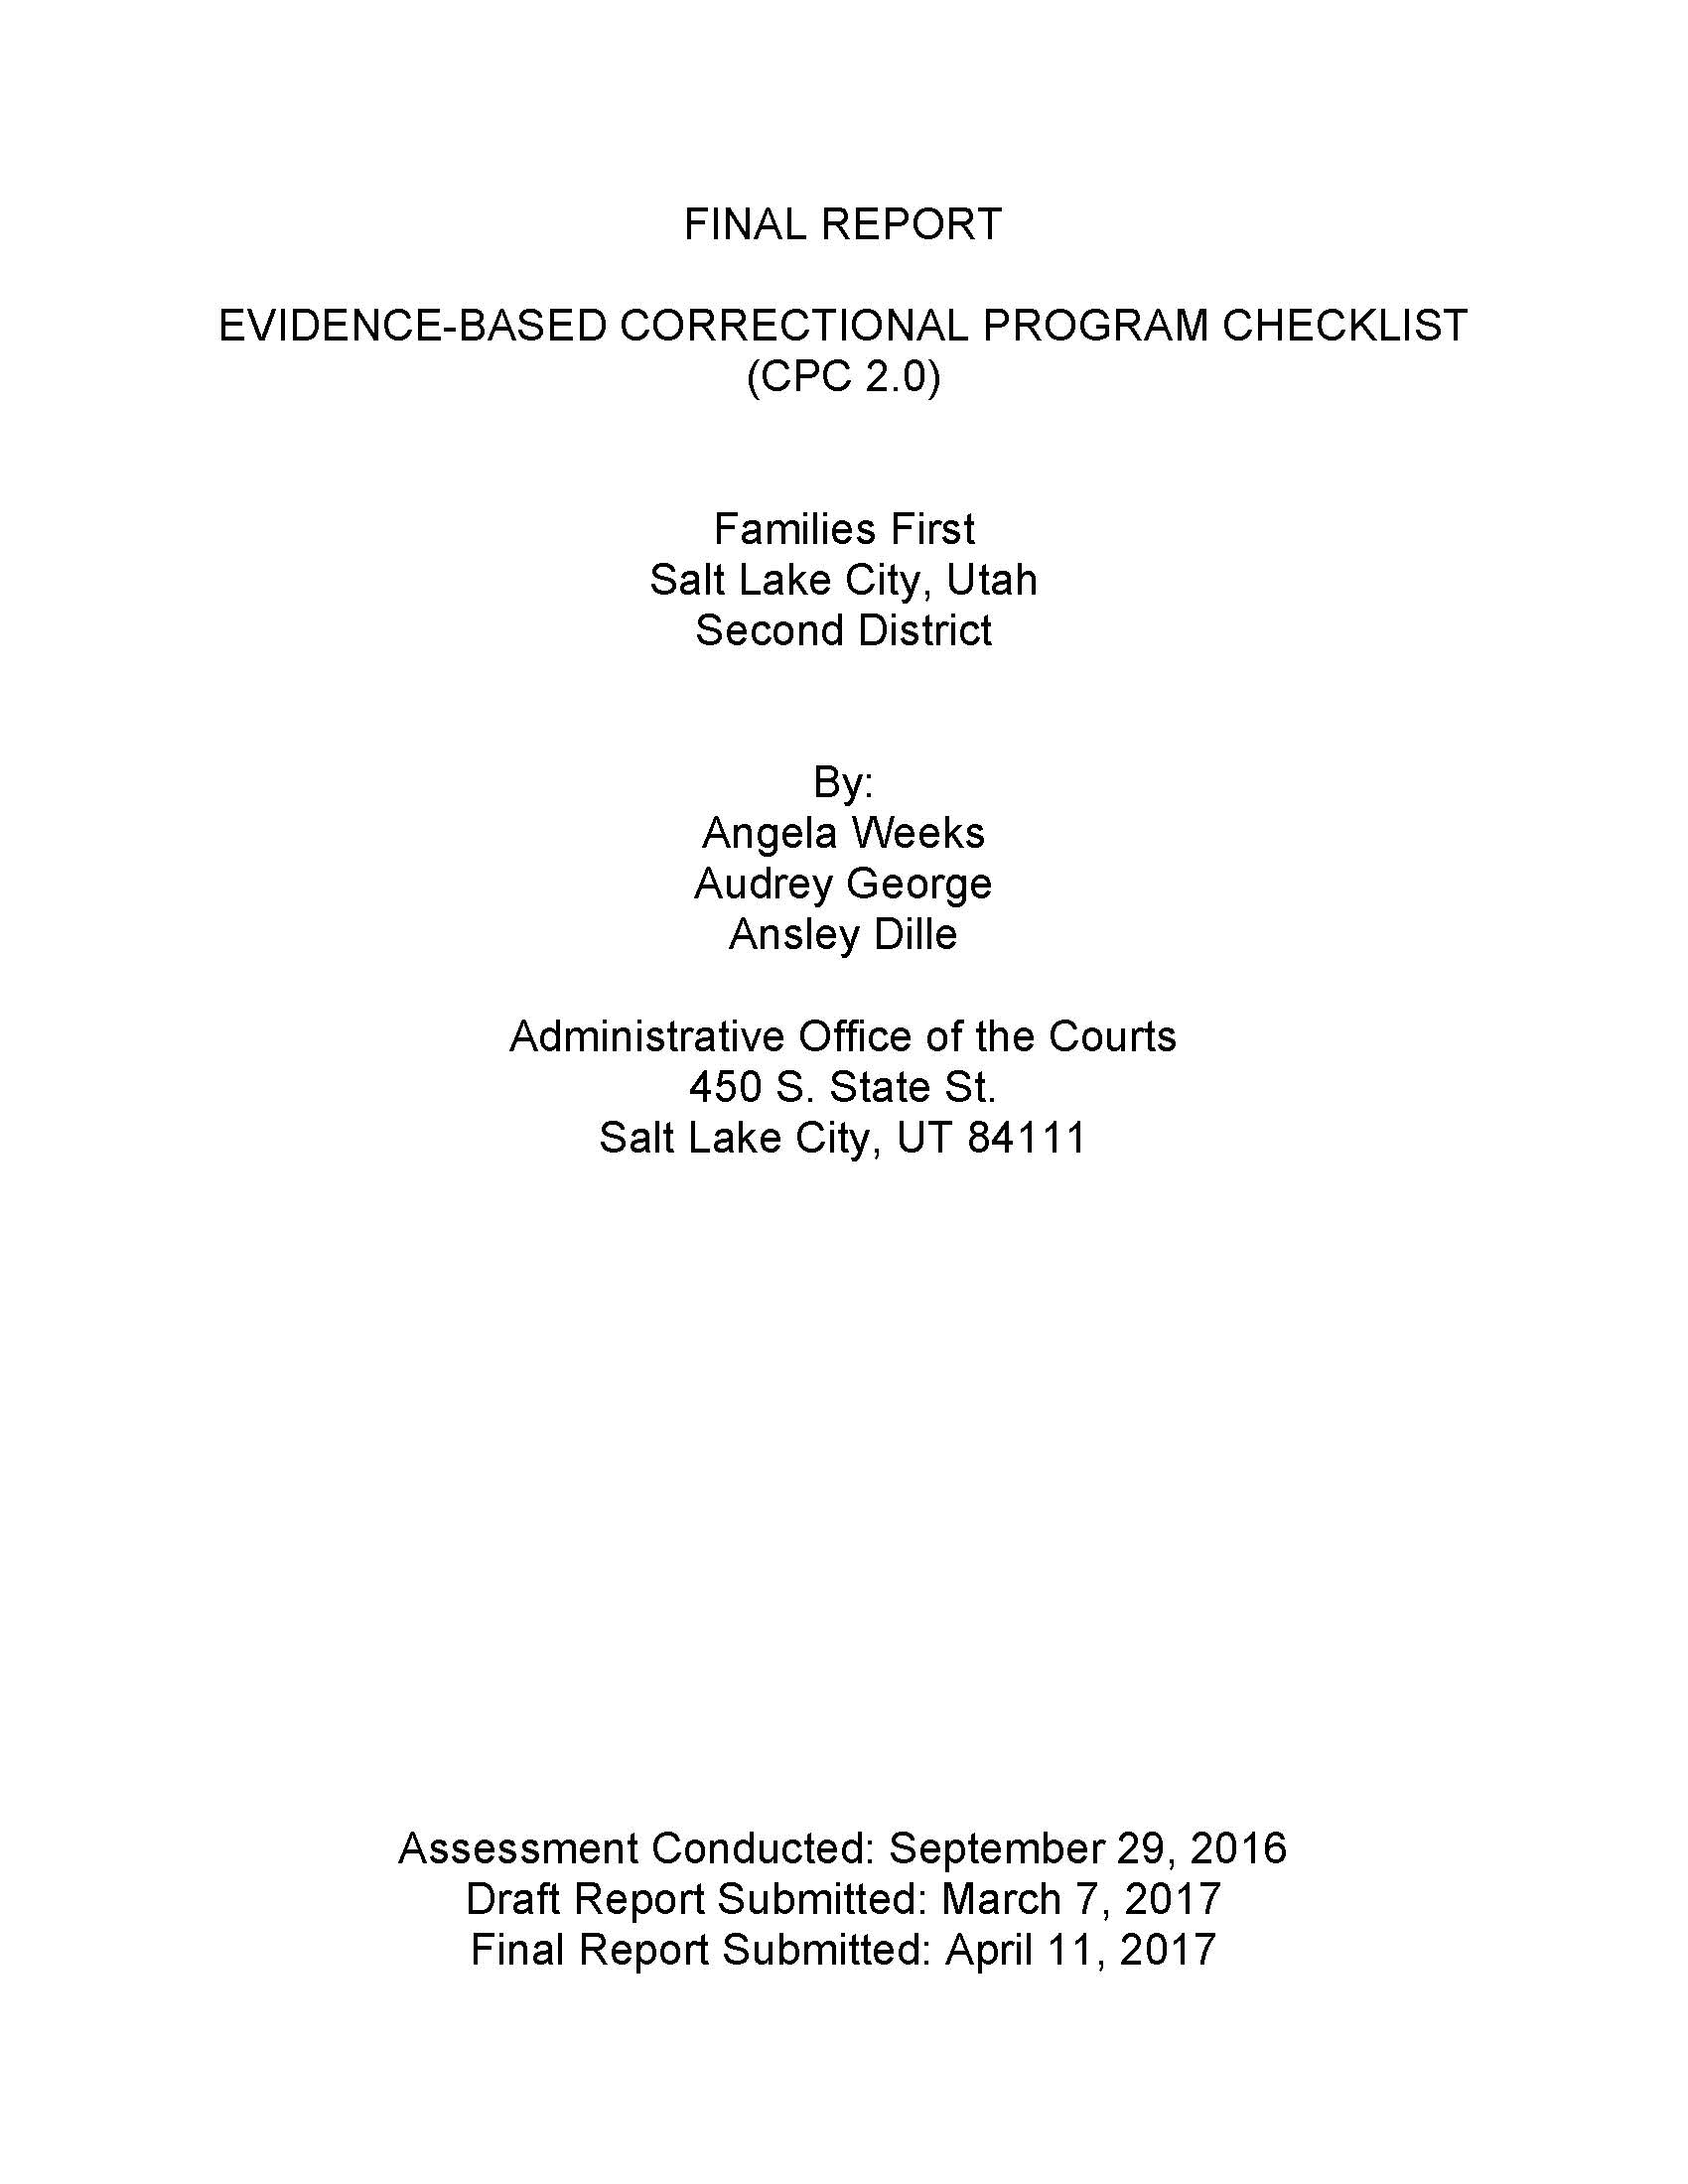 Evidence-based Correctional Program Checklist